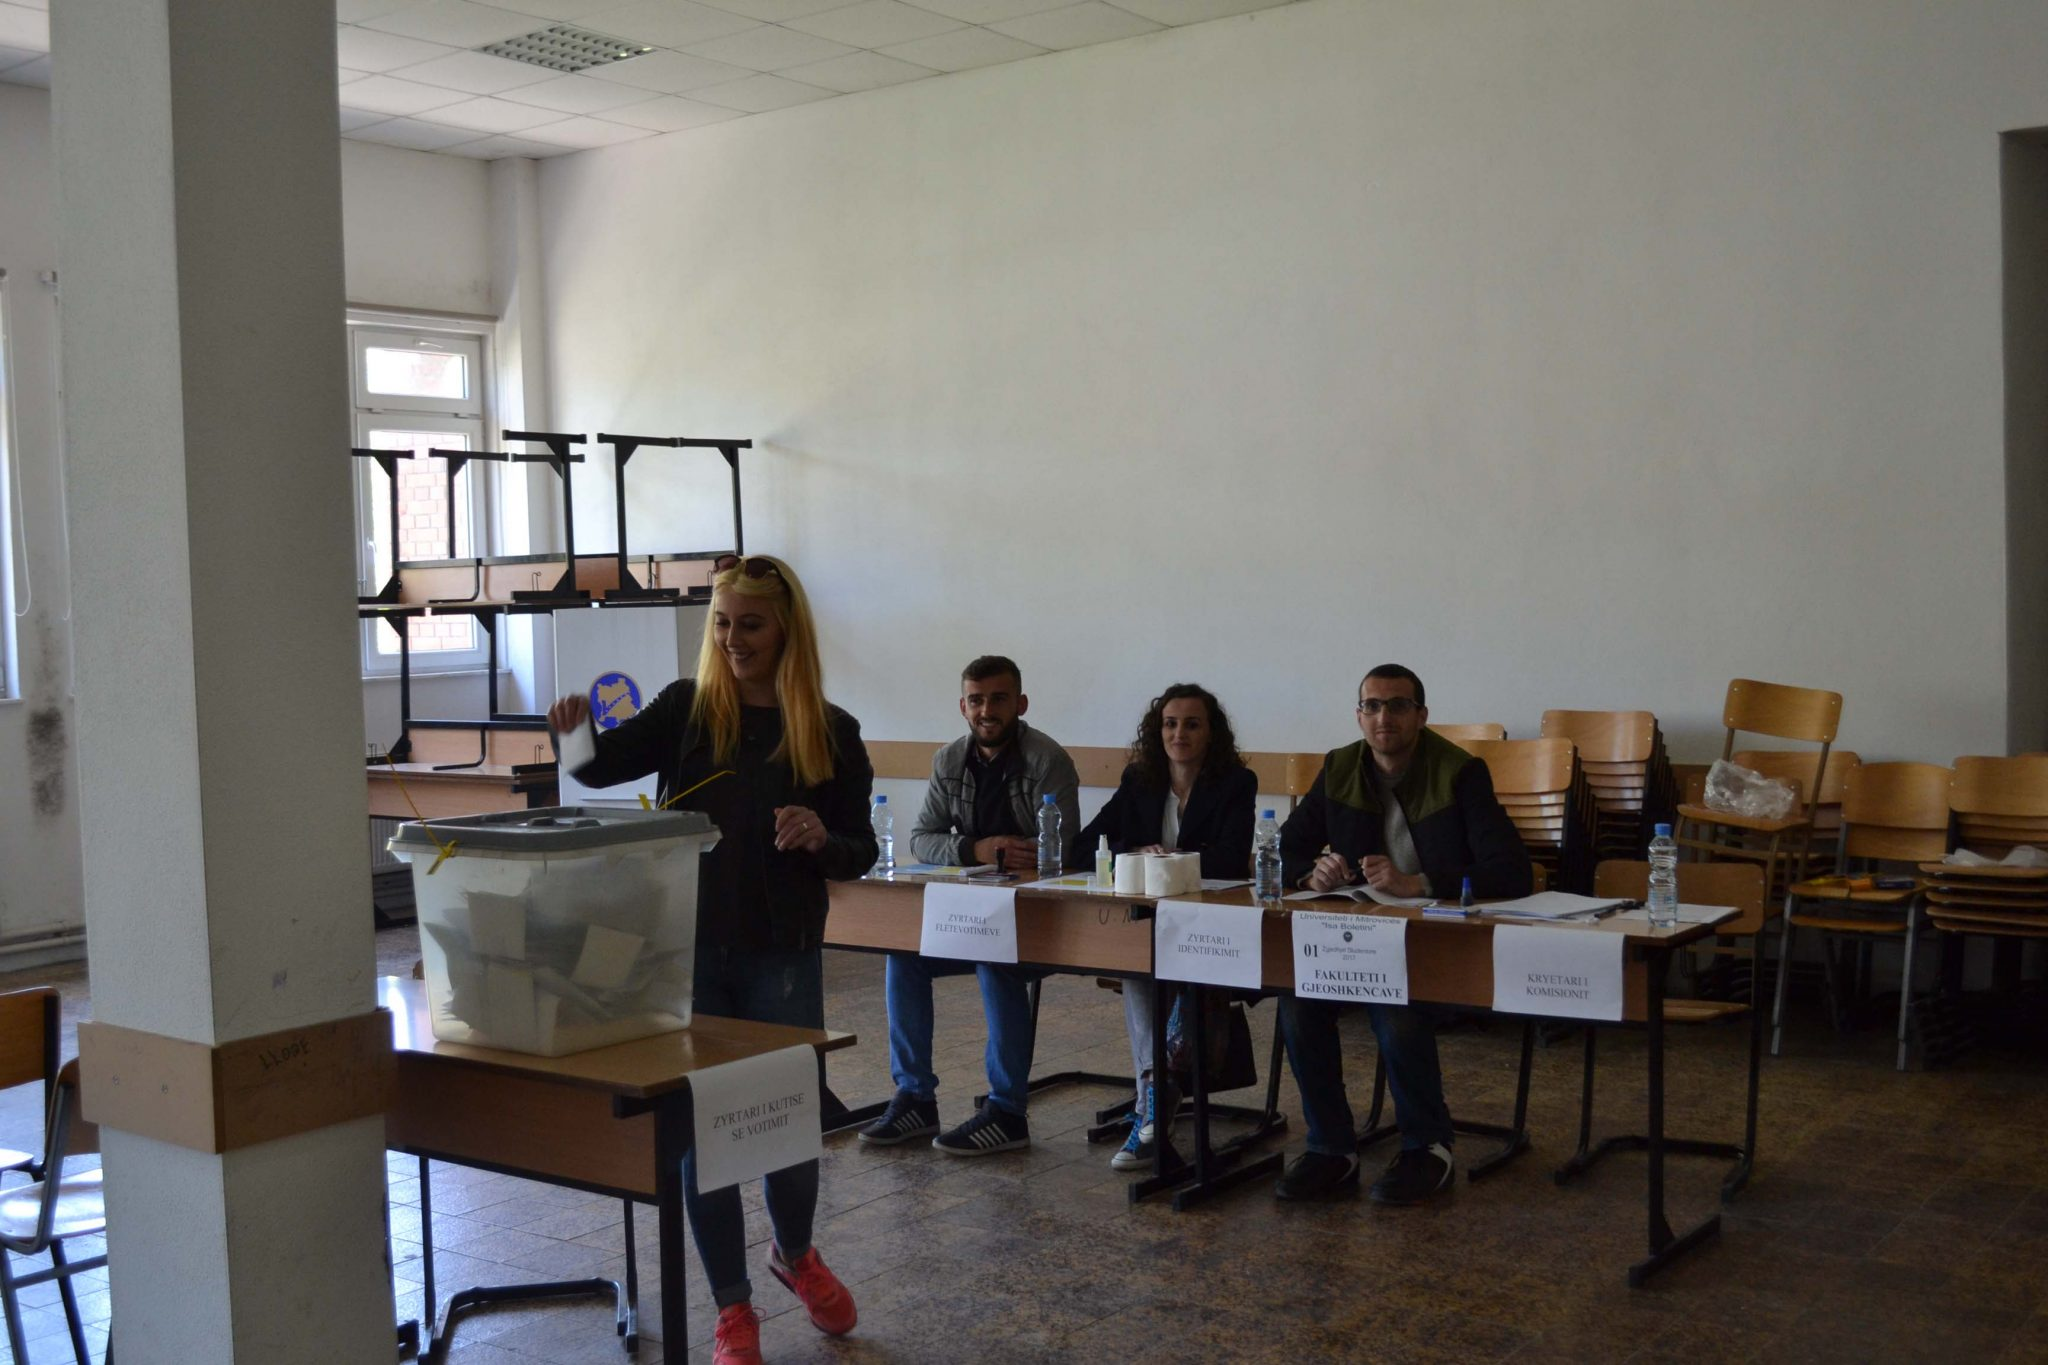 Zgjedhjet Studentore (prill 2017)